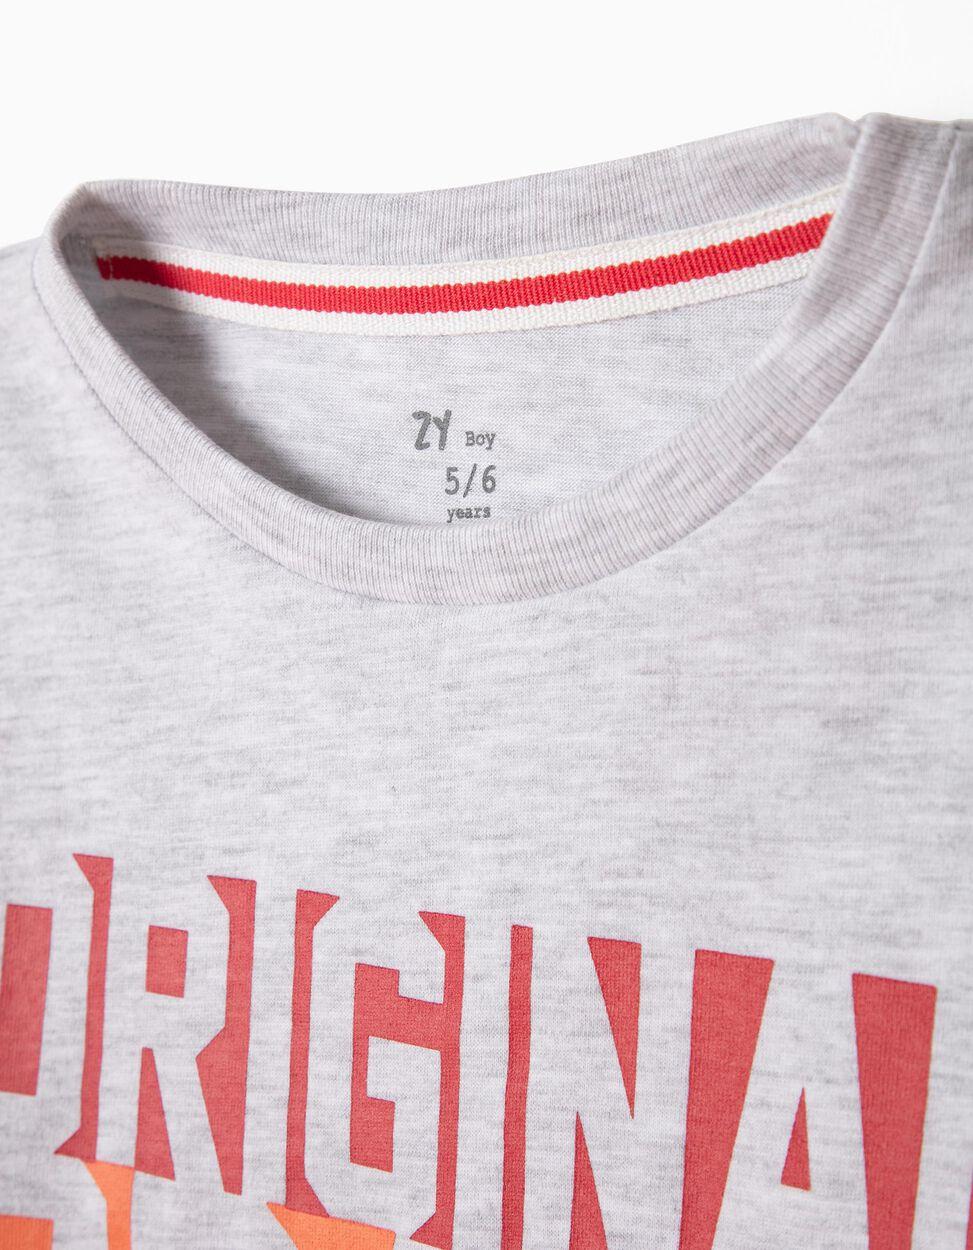 T-shirt Manga Comprida ZY 96 Authentic